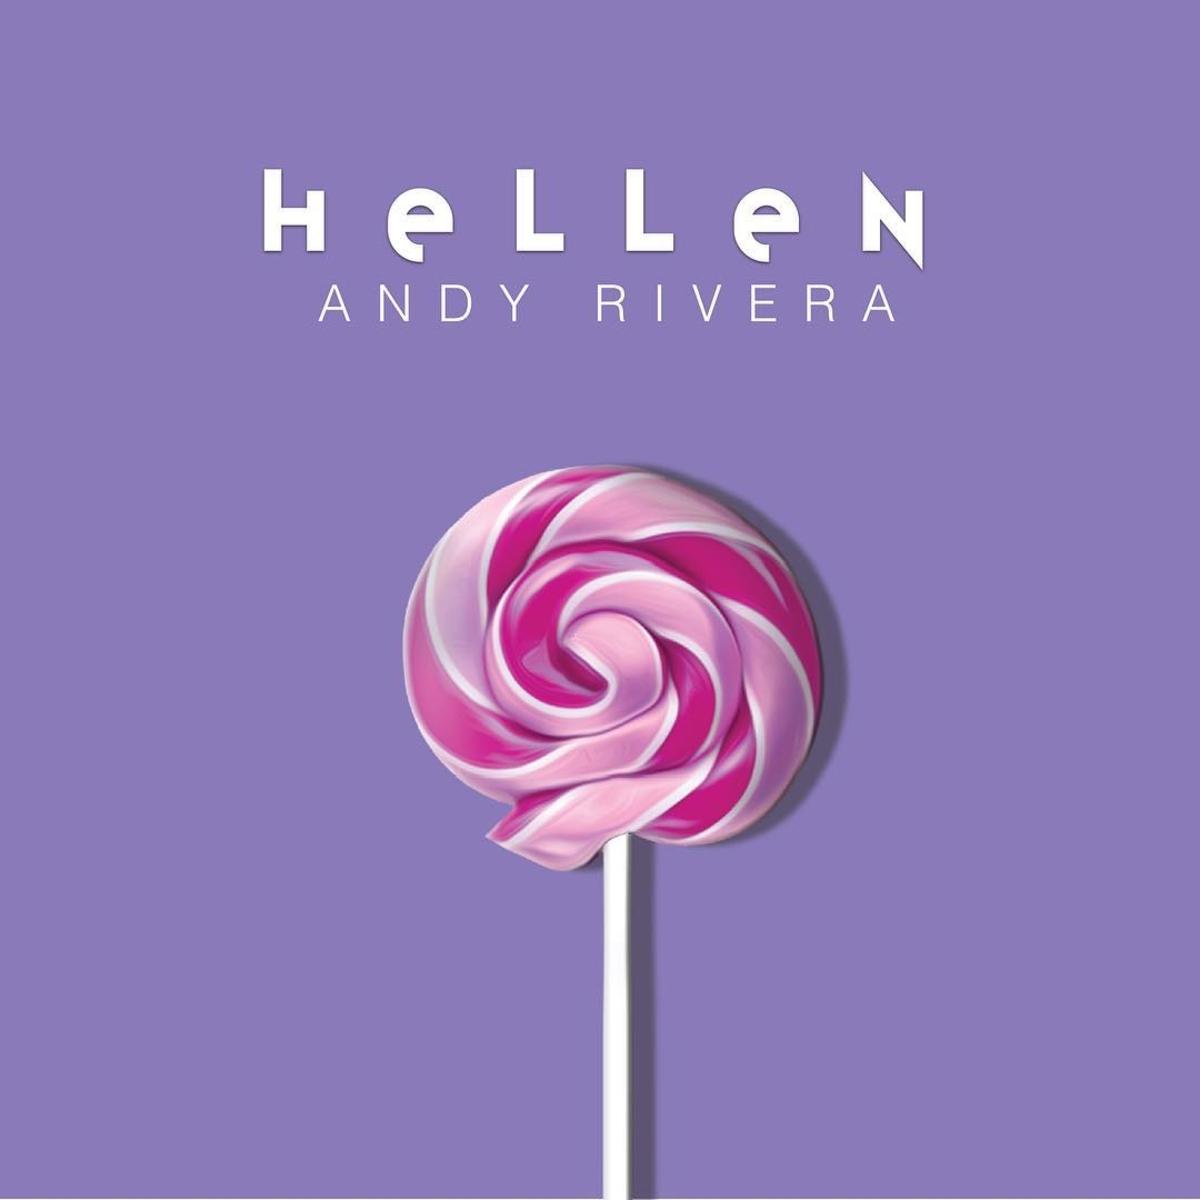 Andy Rivera Hellen - Andy Rivera - Hellen (Official Video)